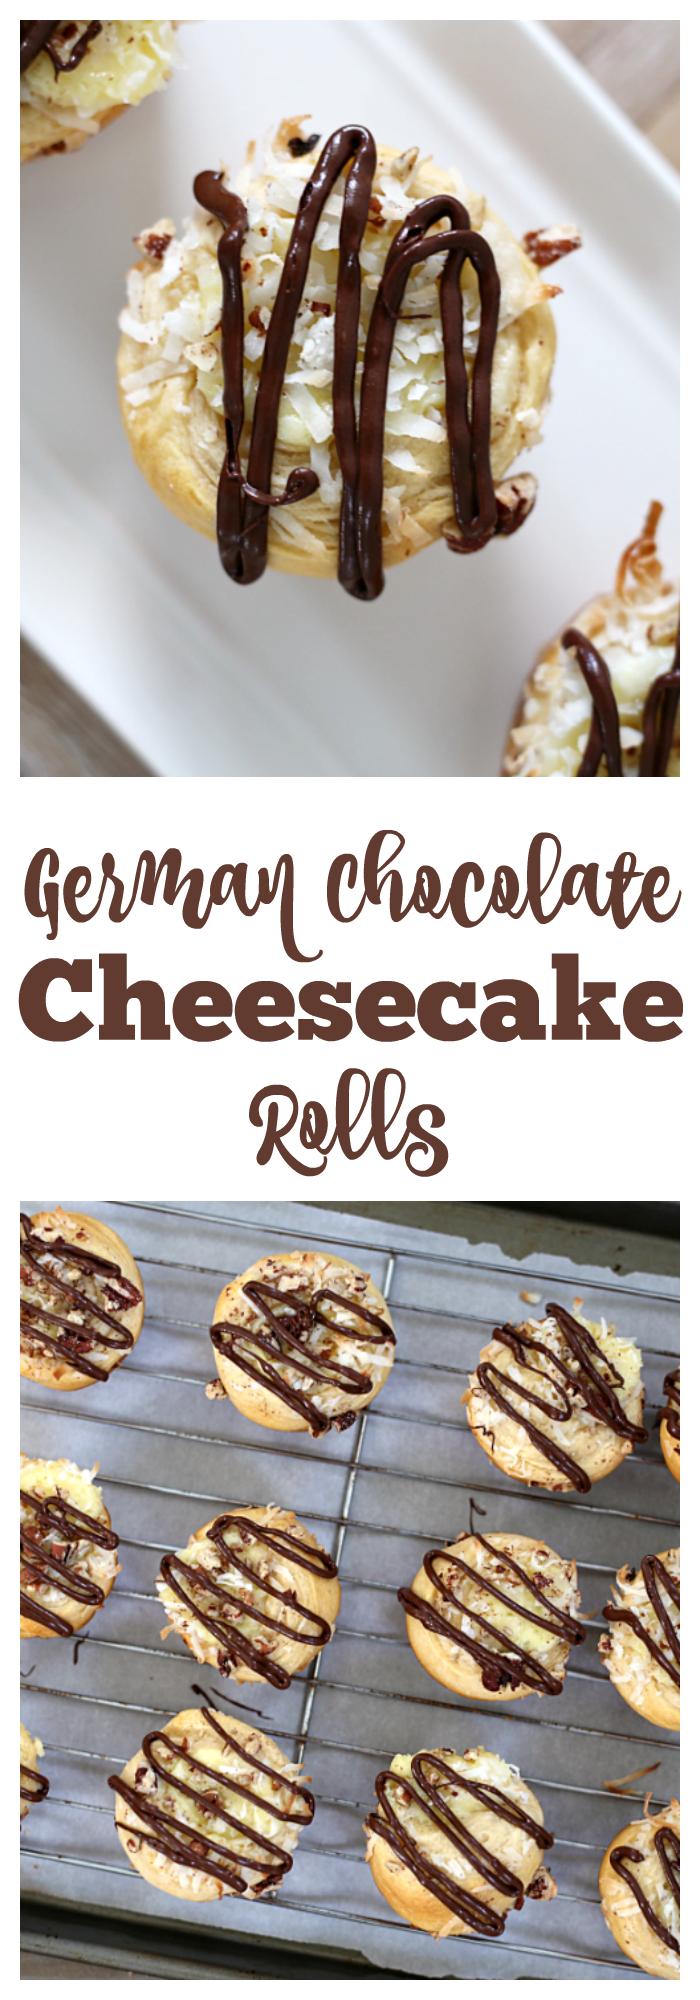 German Chocolate Cheesecake Rolls #germanchocolatecheesecake German Chocolate Cheesecake Rolls #germanchocolatecheesecake